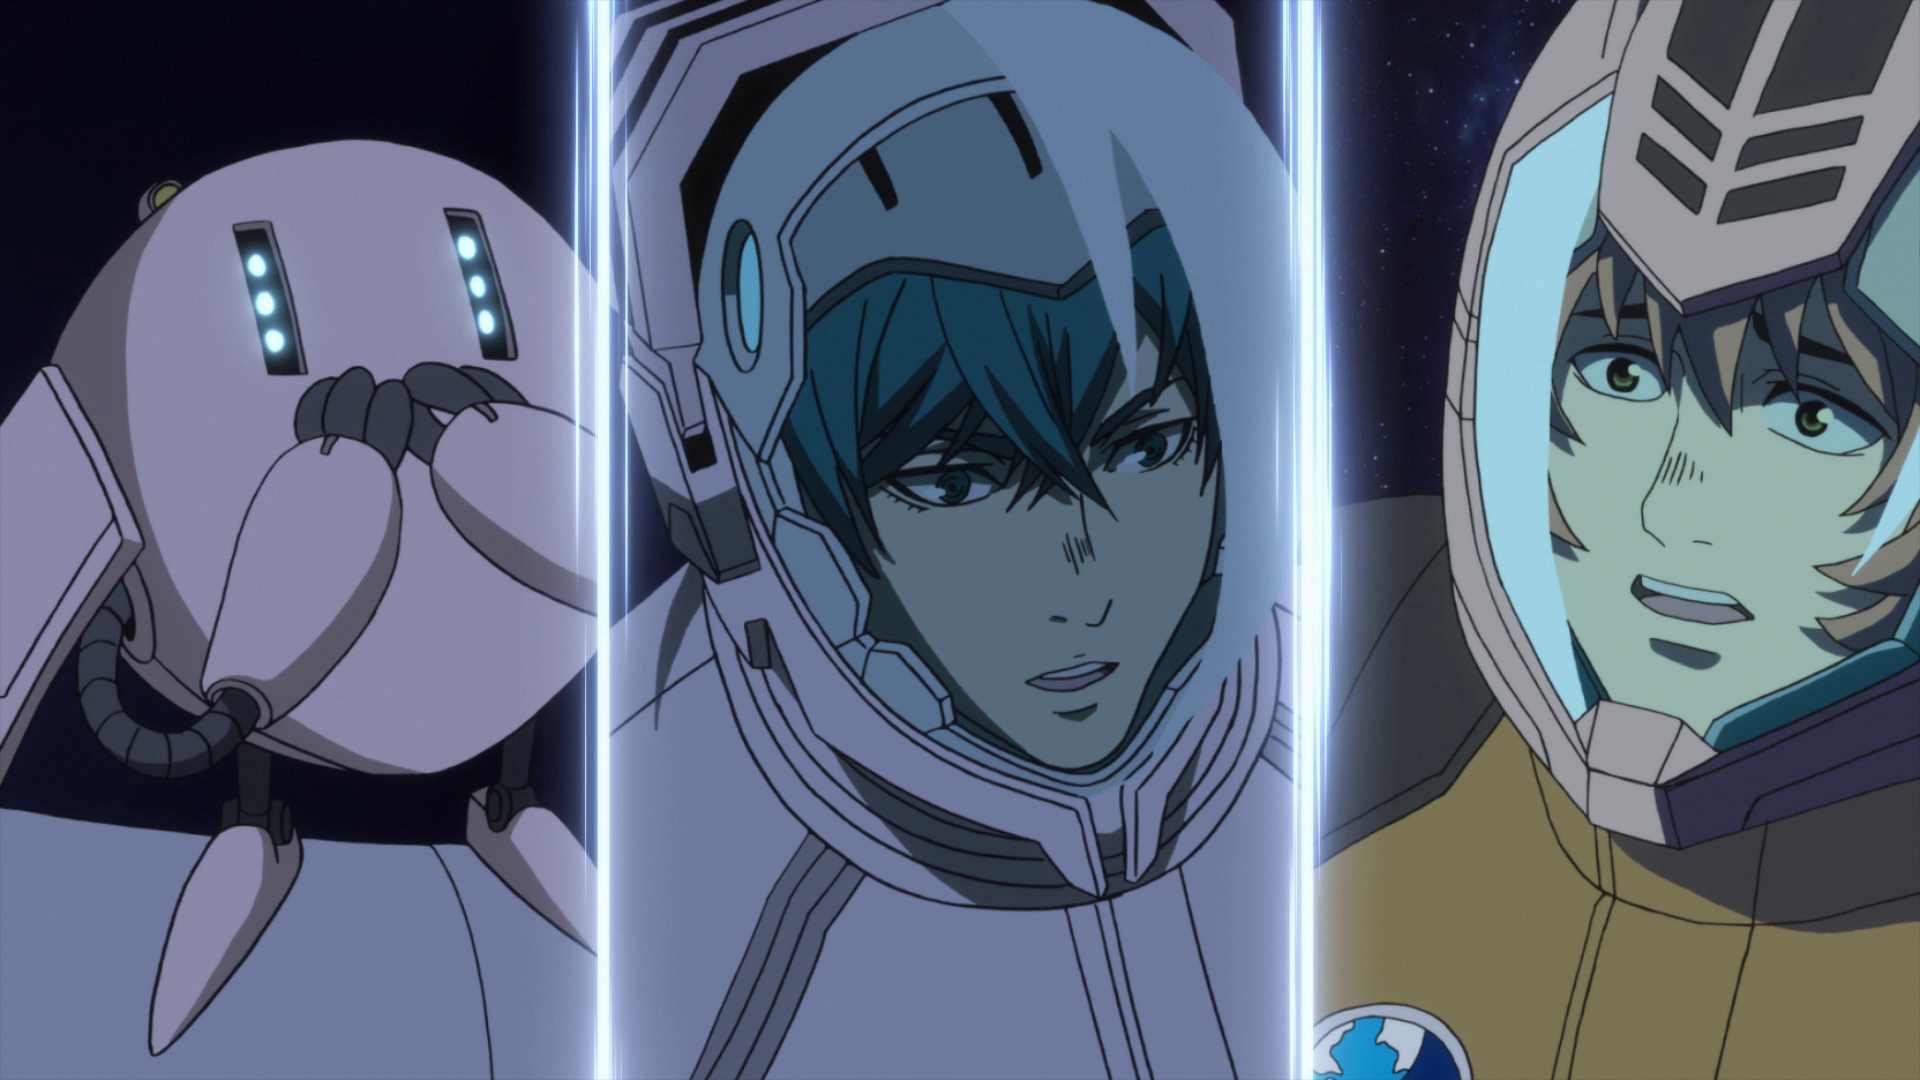 [Golumpa] Space Battleship Tiramisu S2 - 08 (Uchuu Senkan